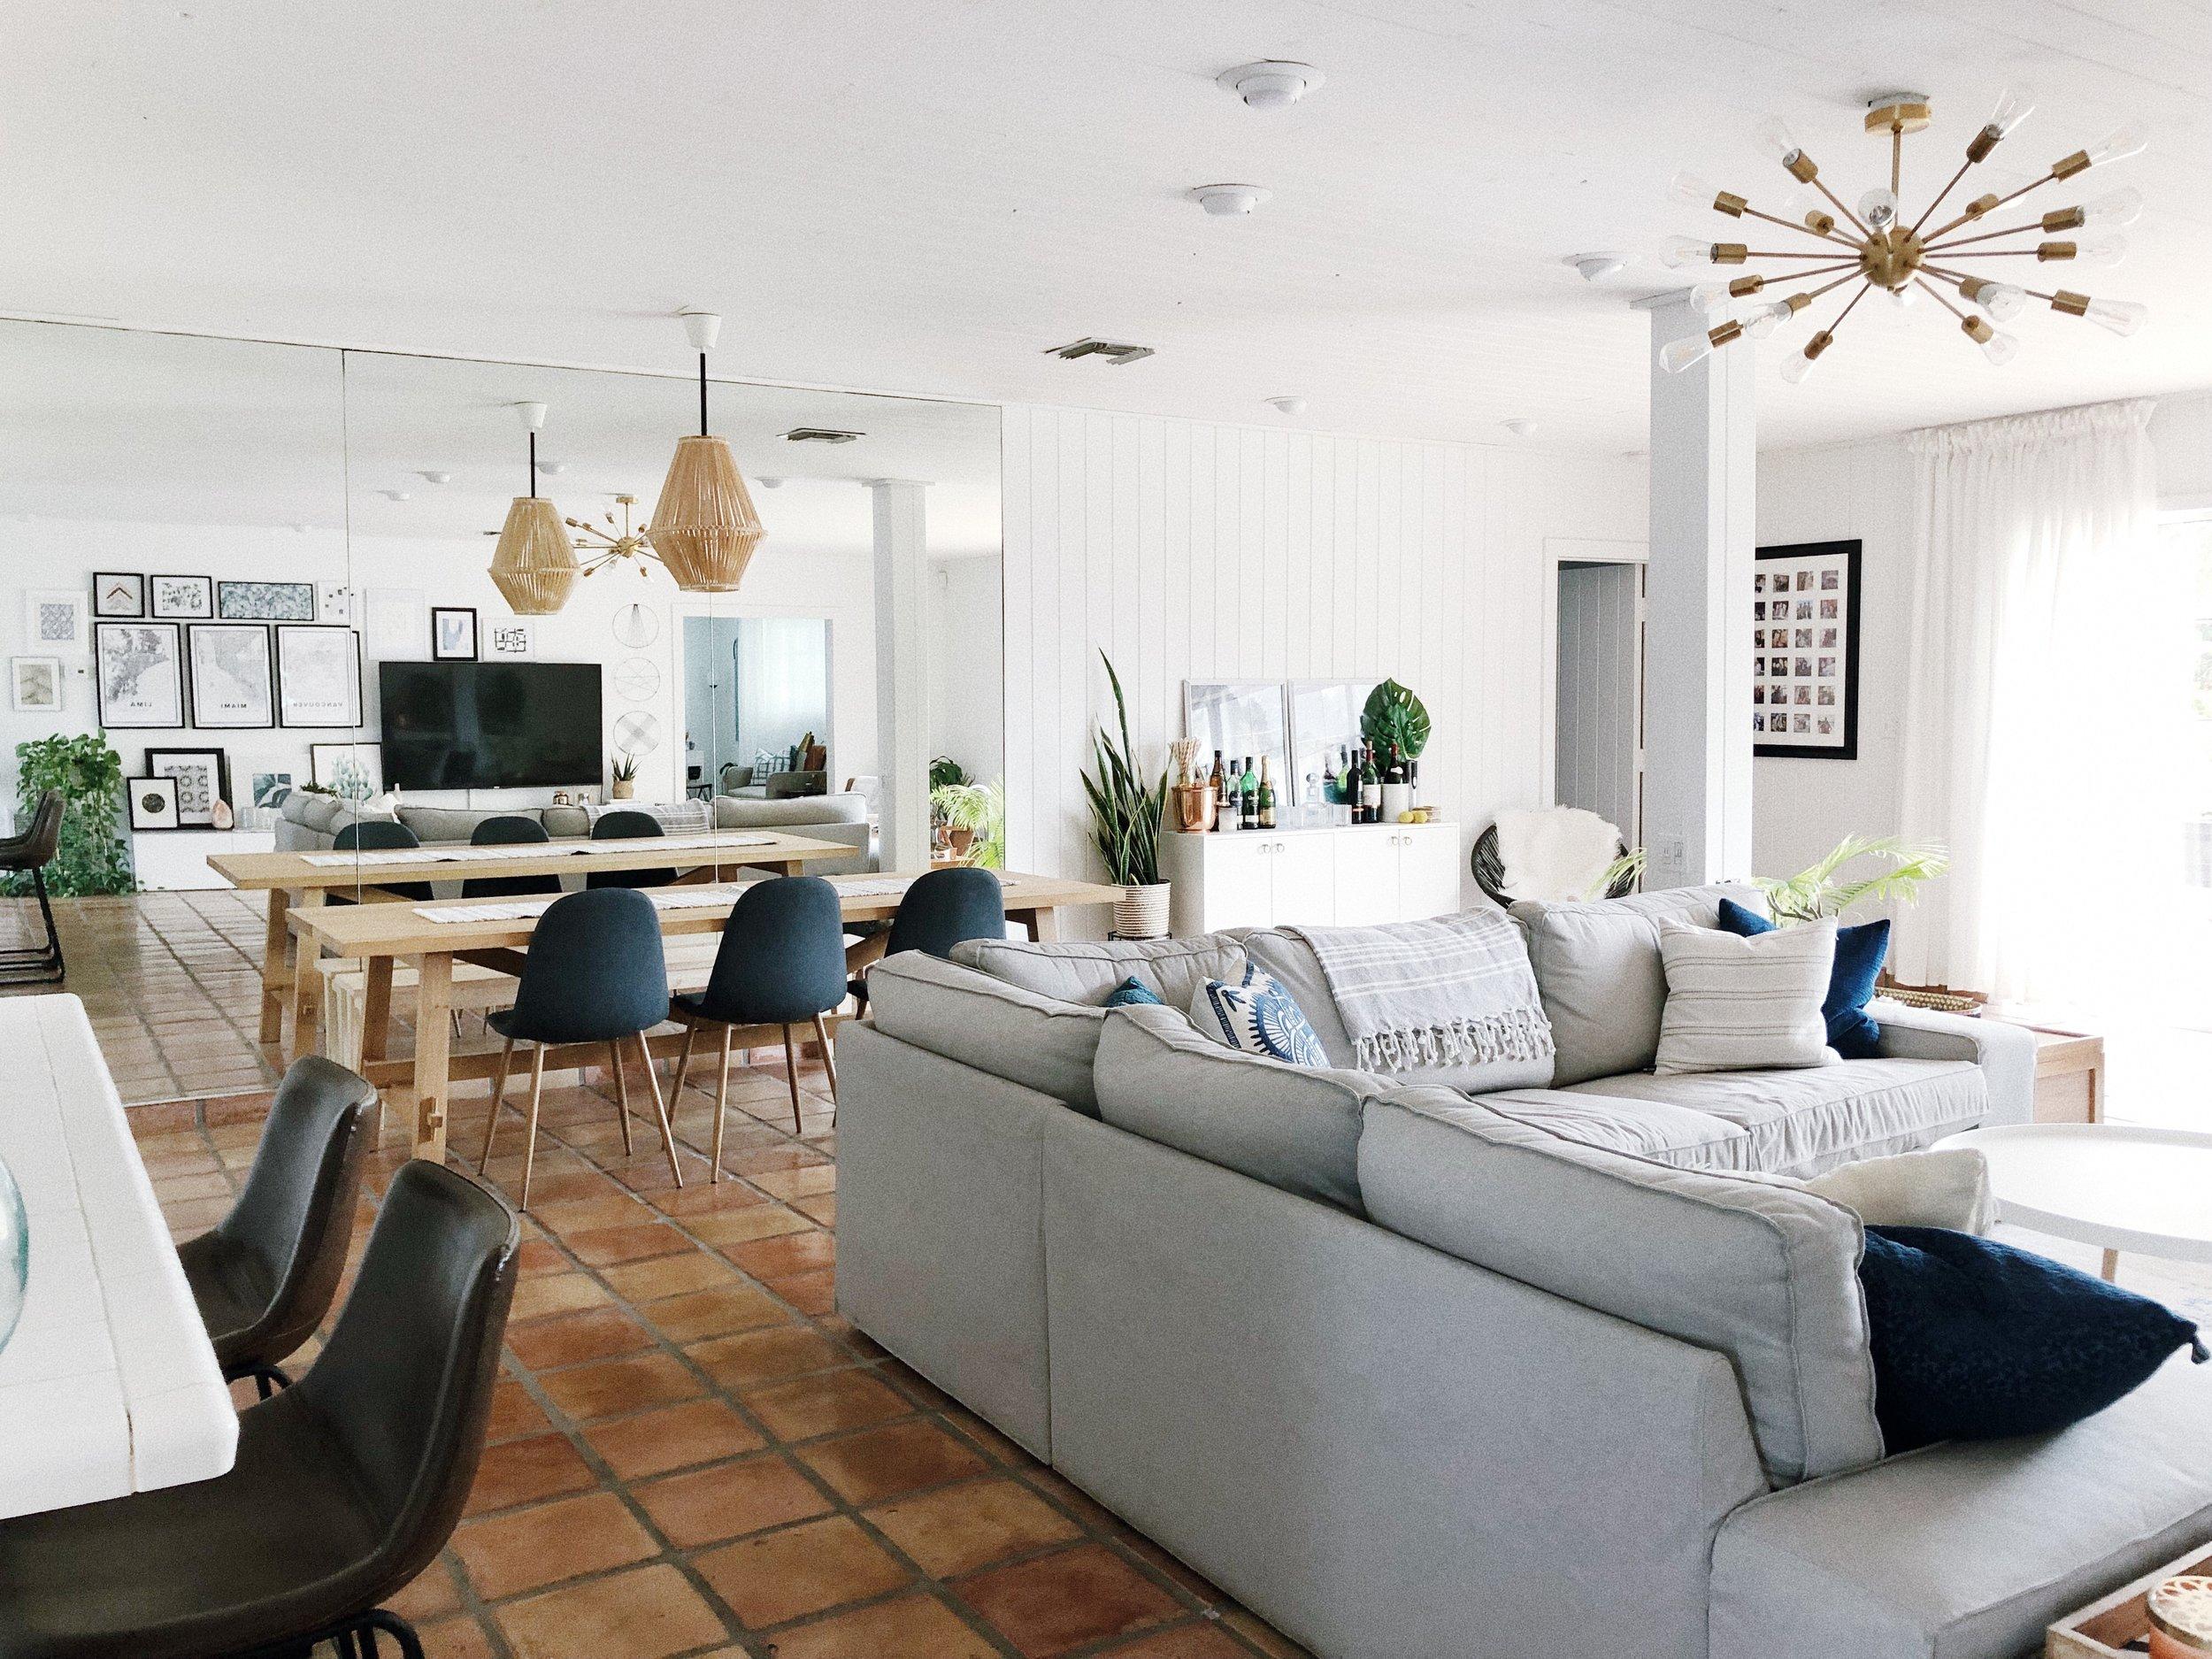 Gallery Wall Tour TWG Home Decor Interior Design Living Room Modern Boho Bohemian 2.jpg